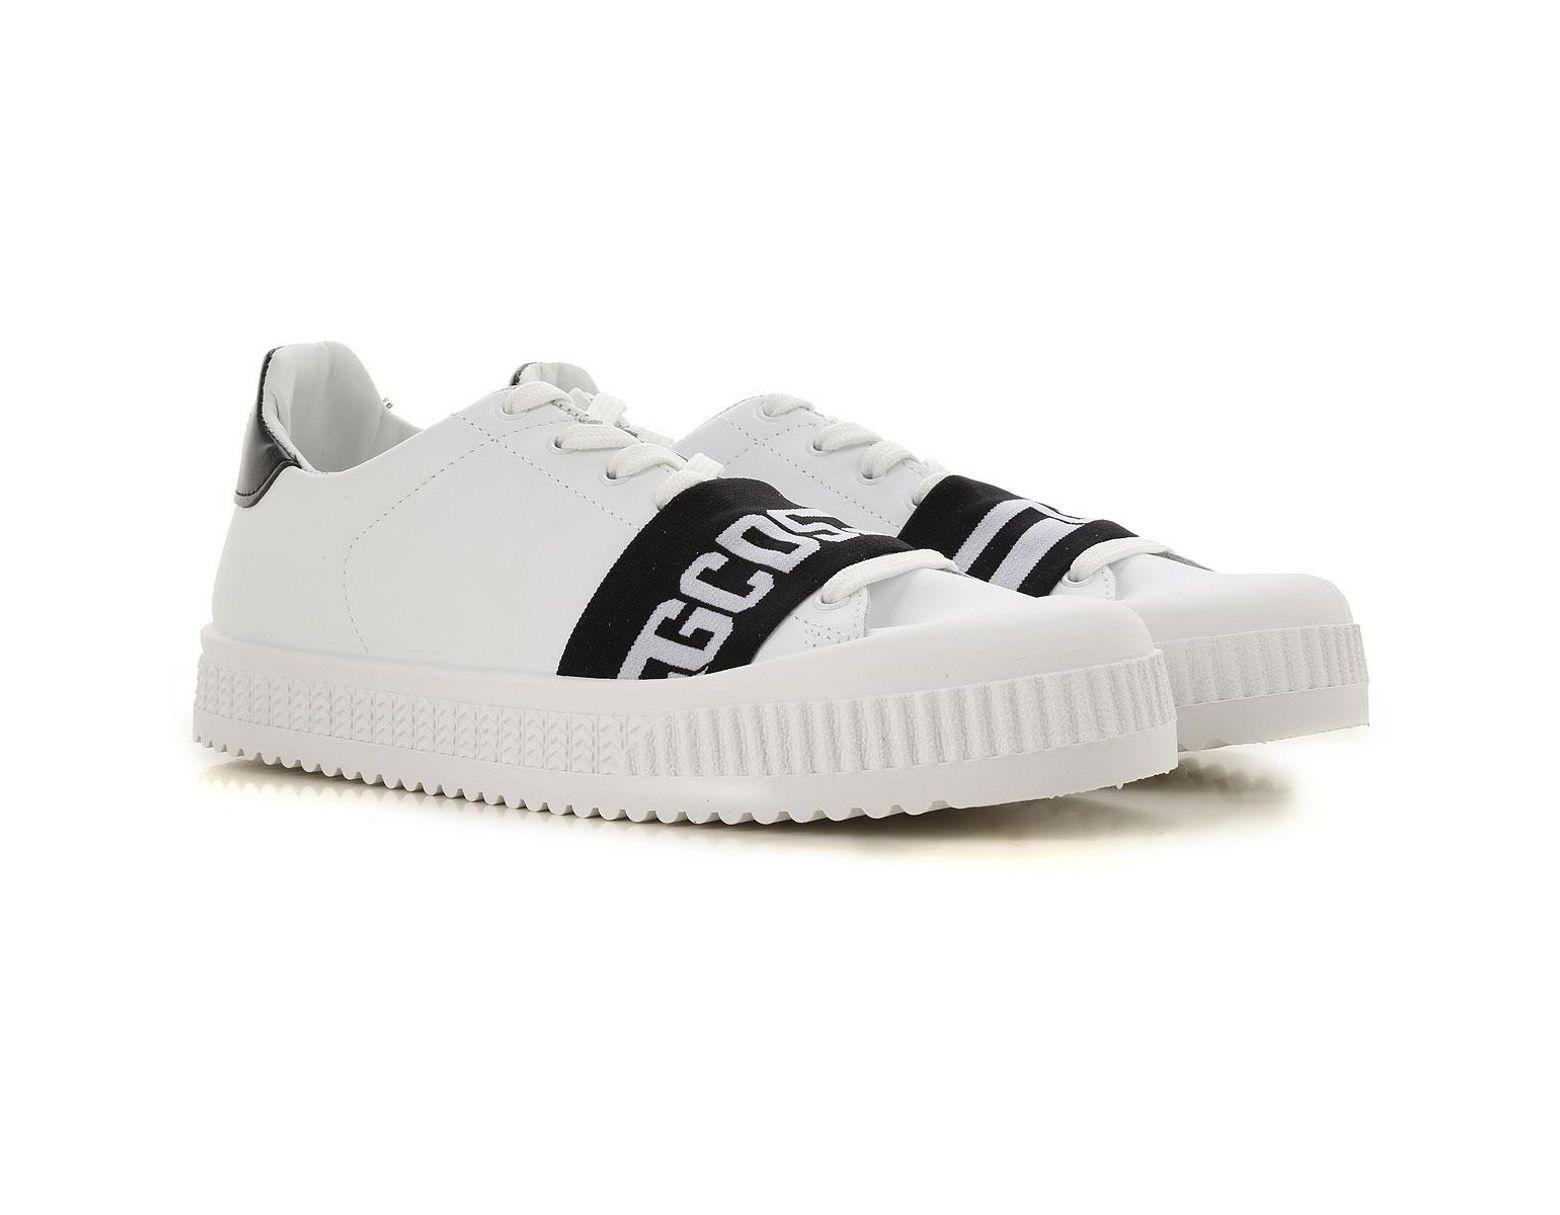 8814d0de413 Black Sneakers For Men On Sale